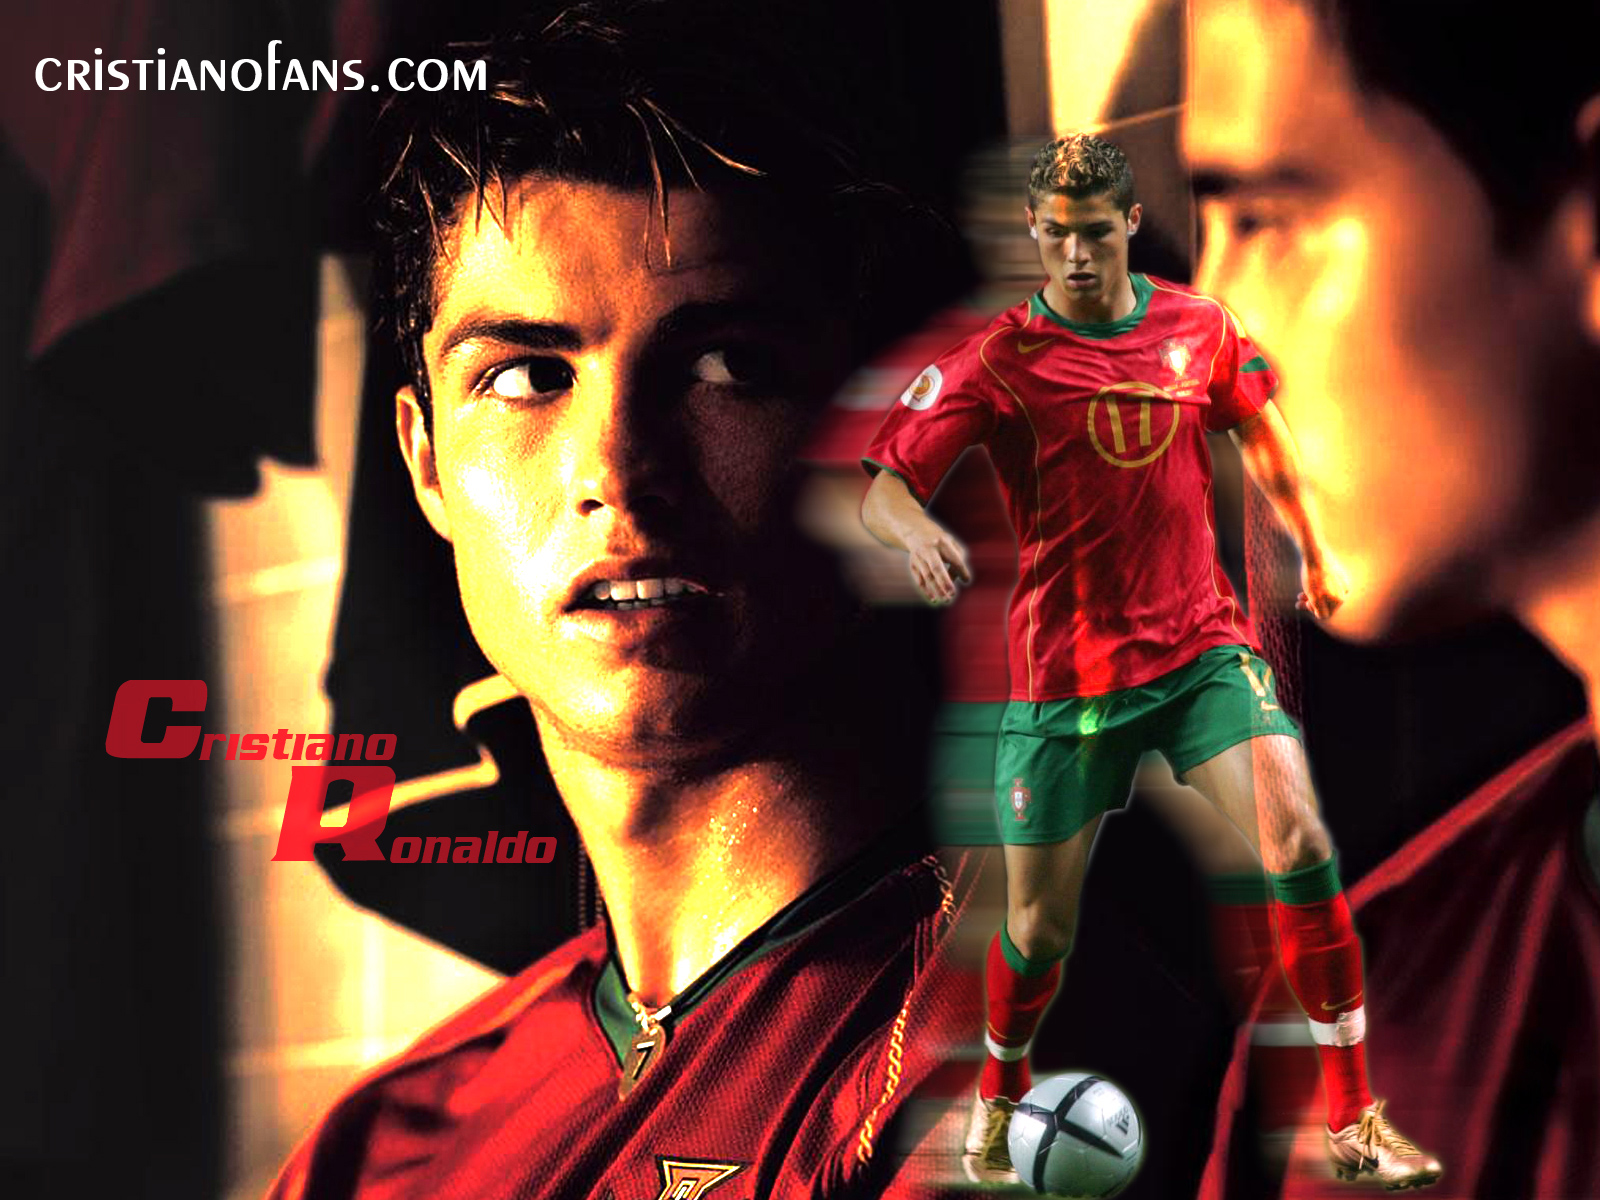 http://1.bp.blogspot.com/-becGjfEBz9E/TZ1qHM2jkPI/AAAAAAAABak/GWtOgJFY9wU/s1600/ronaldo+wallpapers+2011++Cristiano-Ronaldo-Wallpaper.jpg